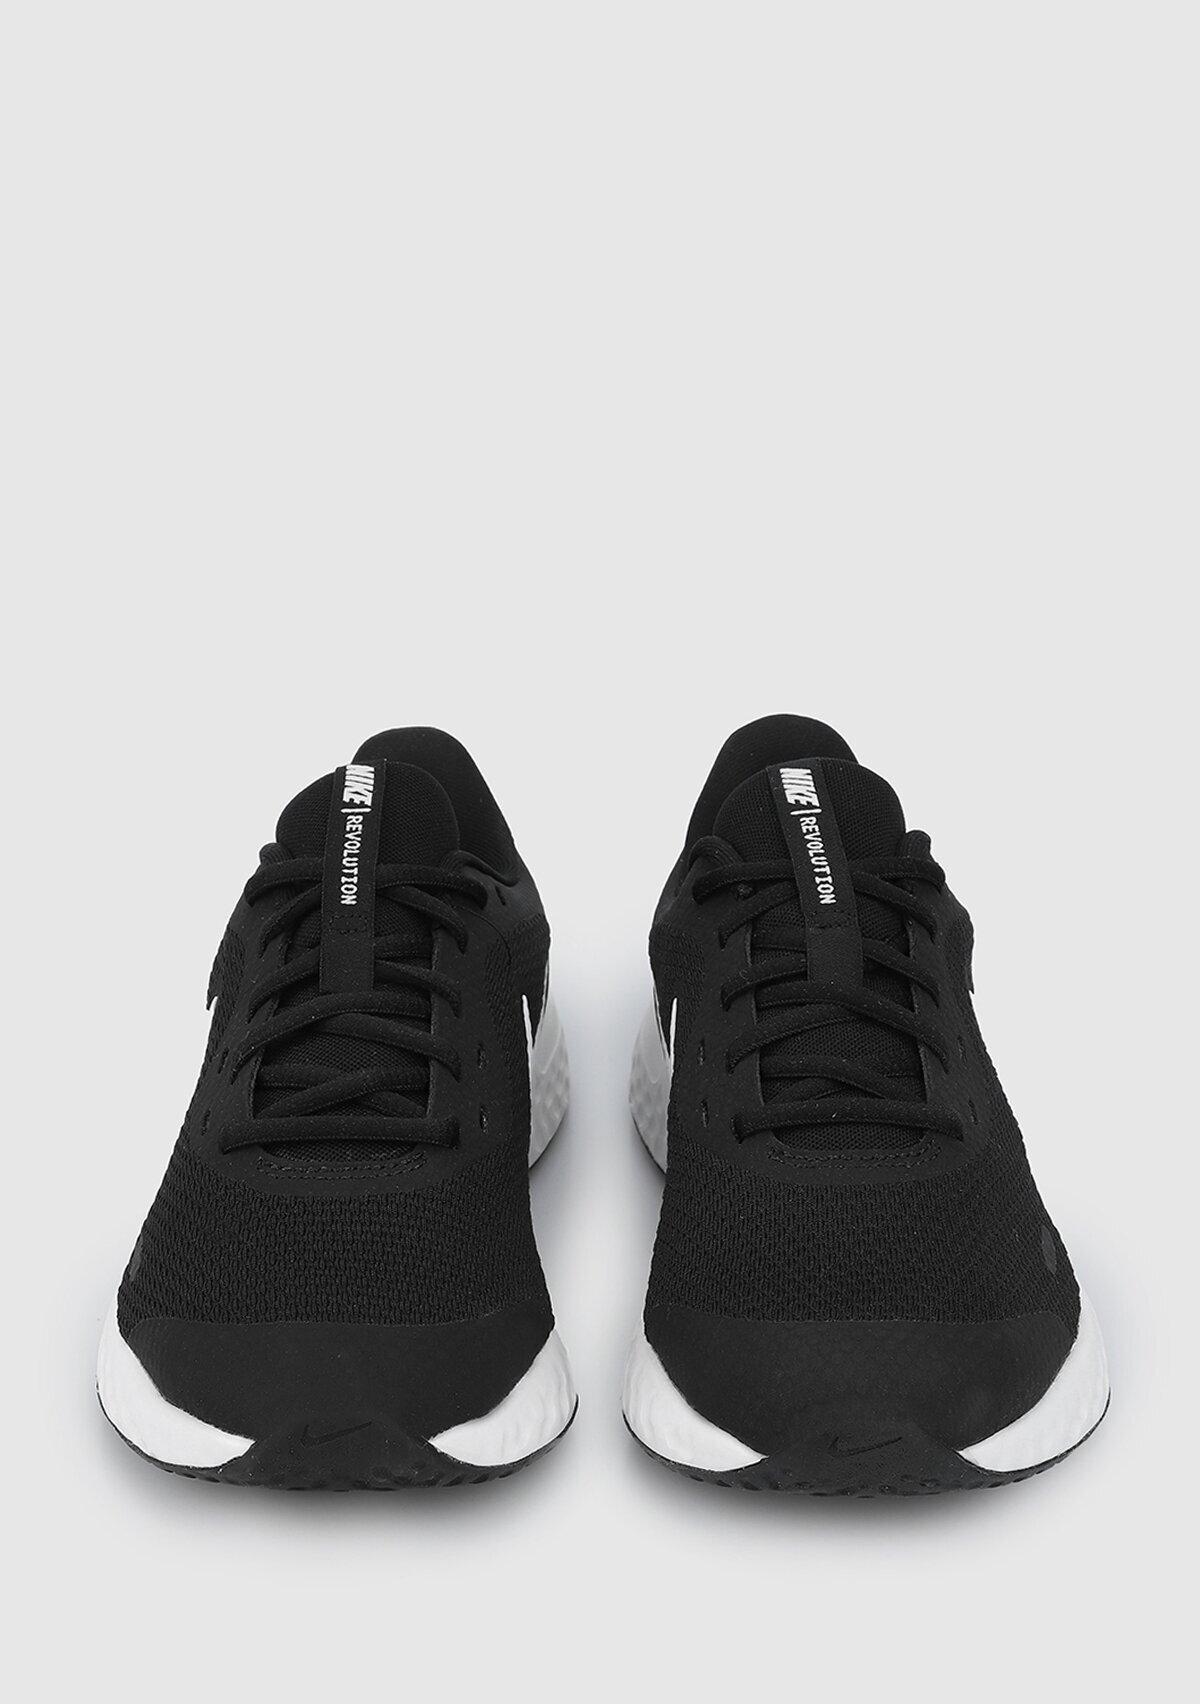 resm Revolution 5 Siyah Kadın Sneaker Bq5671-003